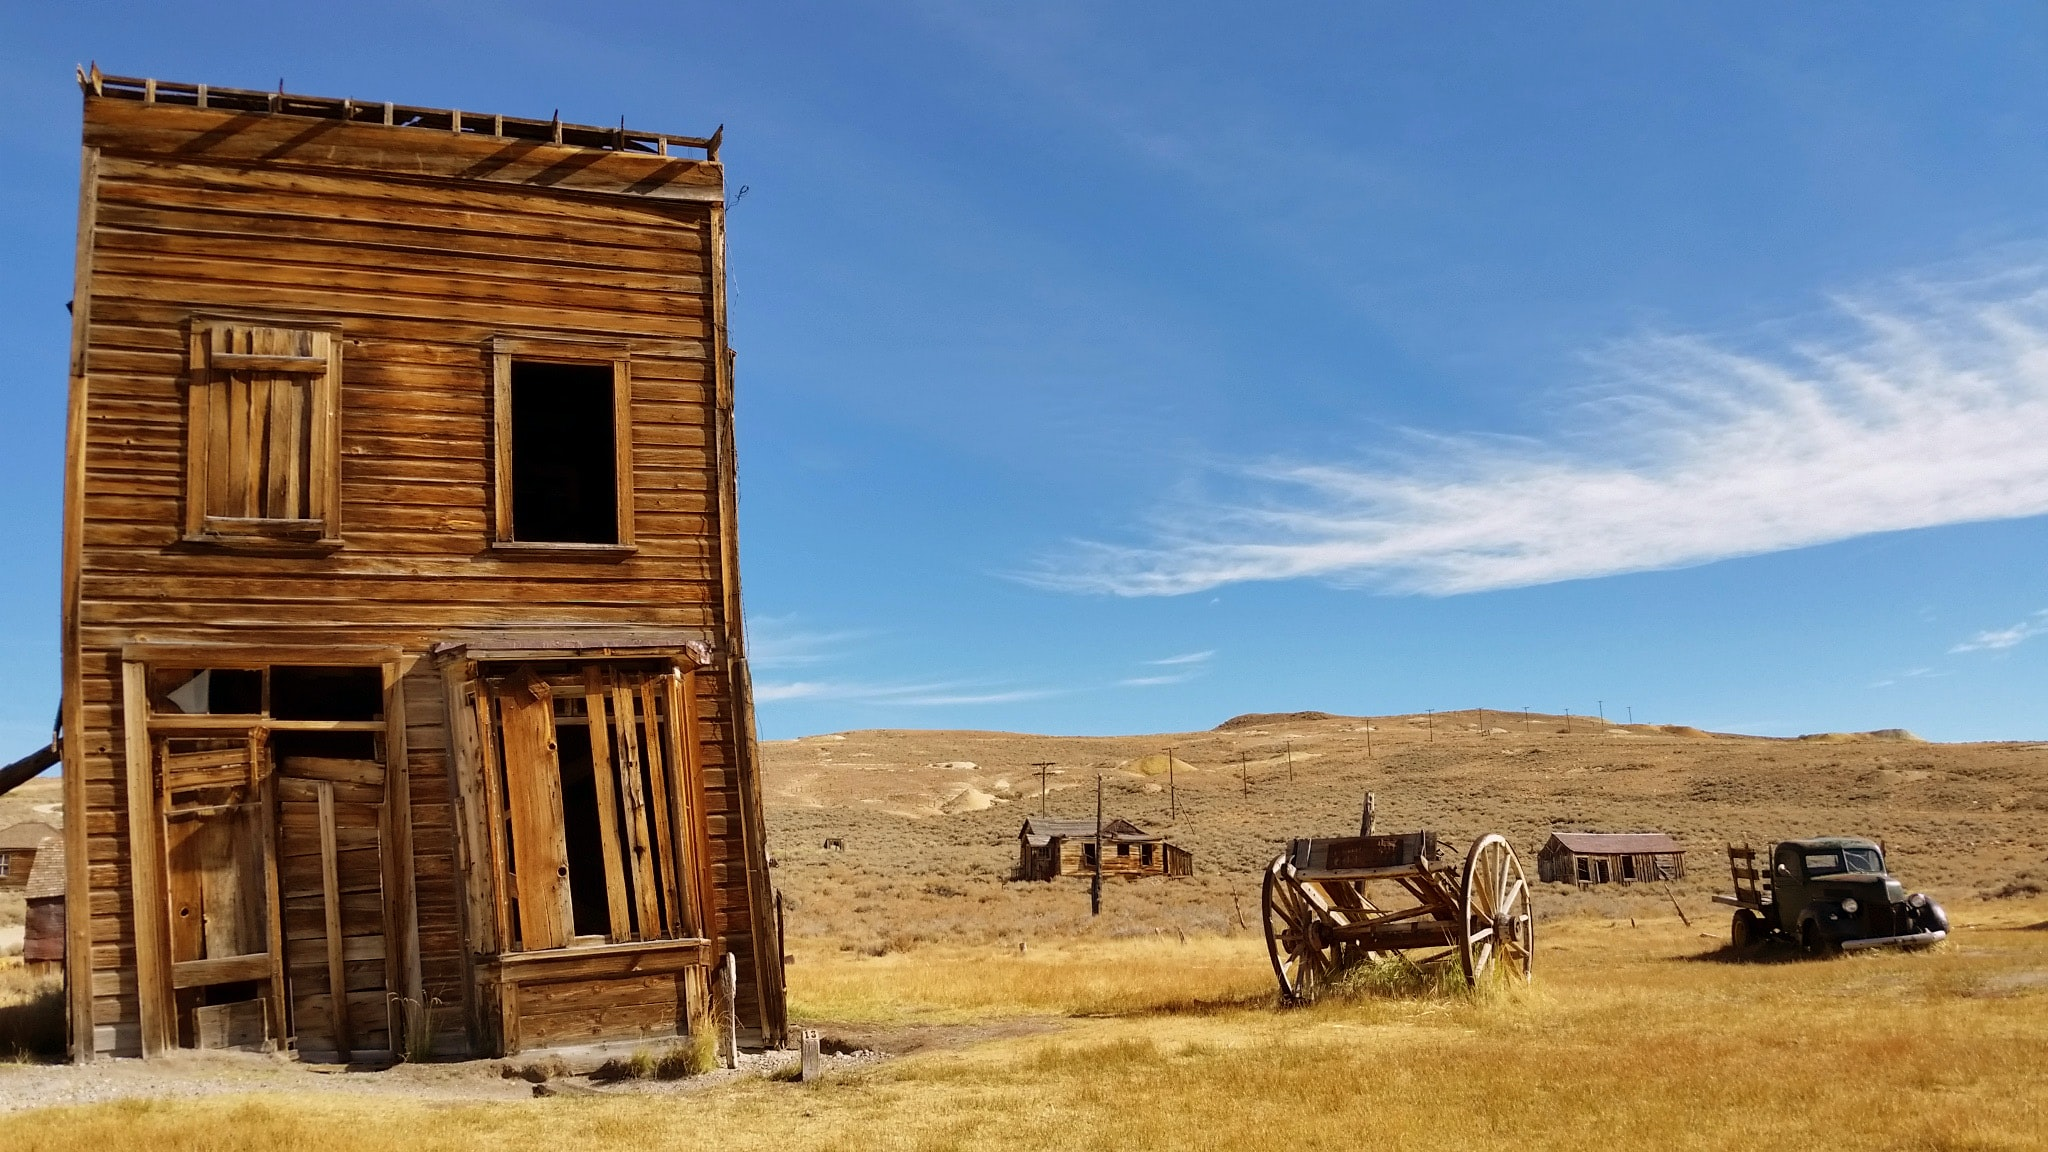 5 spookiest ghost towns across the U.S.